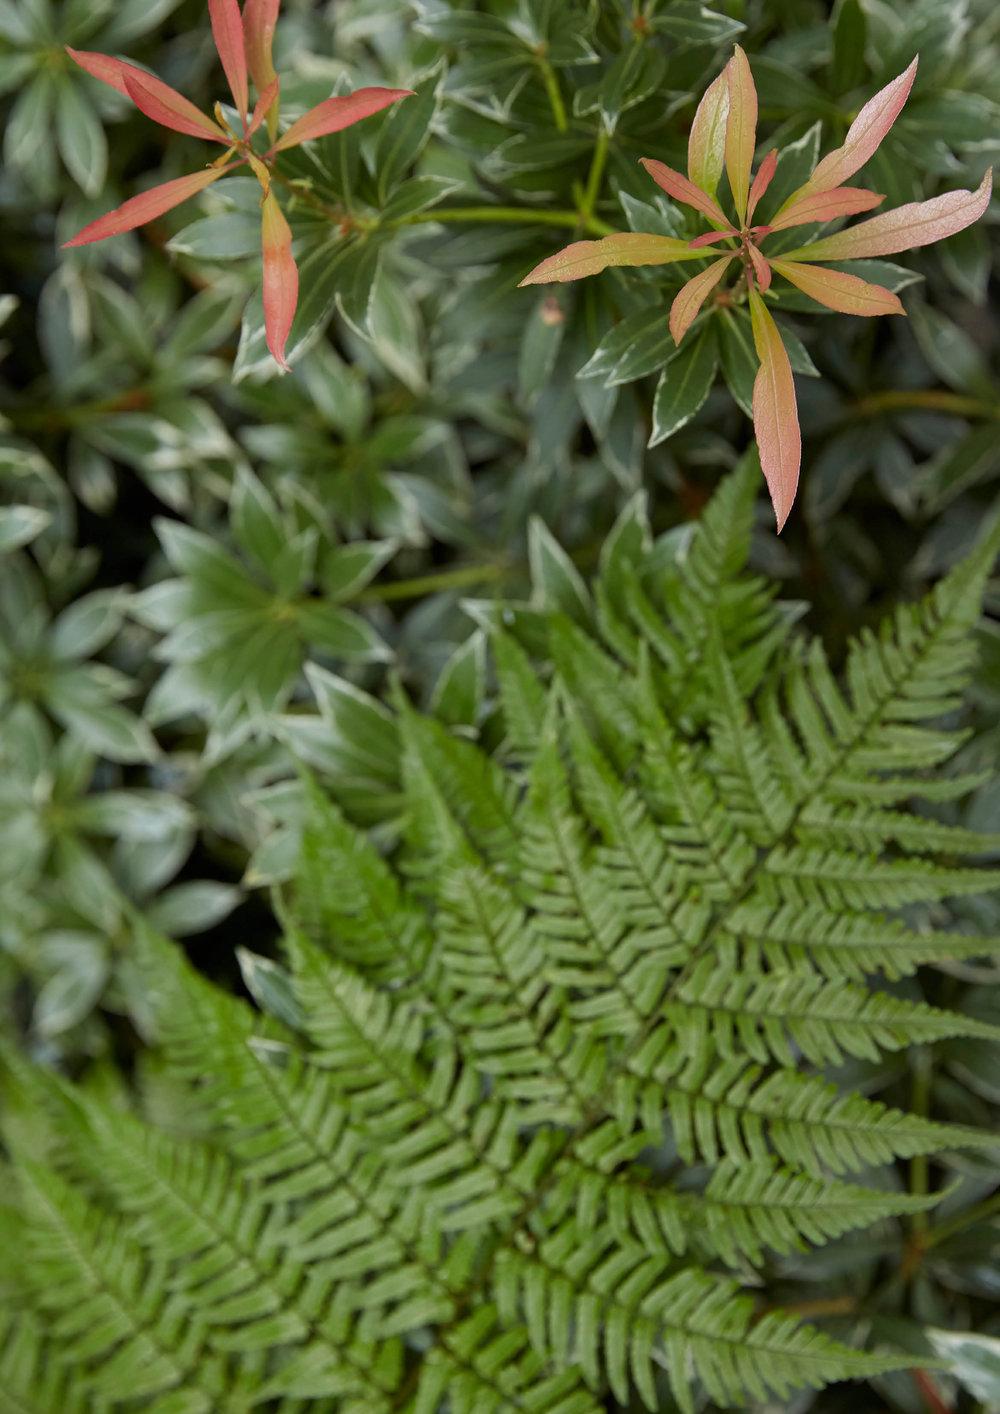 Dryopteris erythrosora & Pieris japonica 'Moutain Fire'